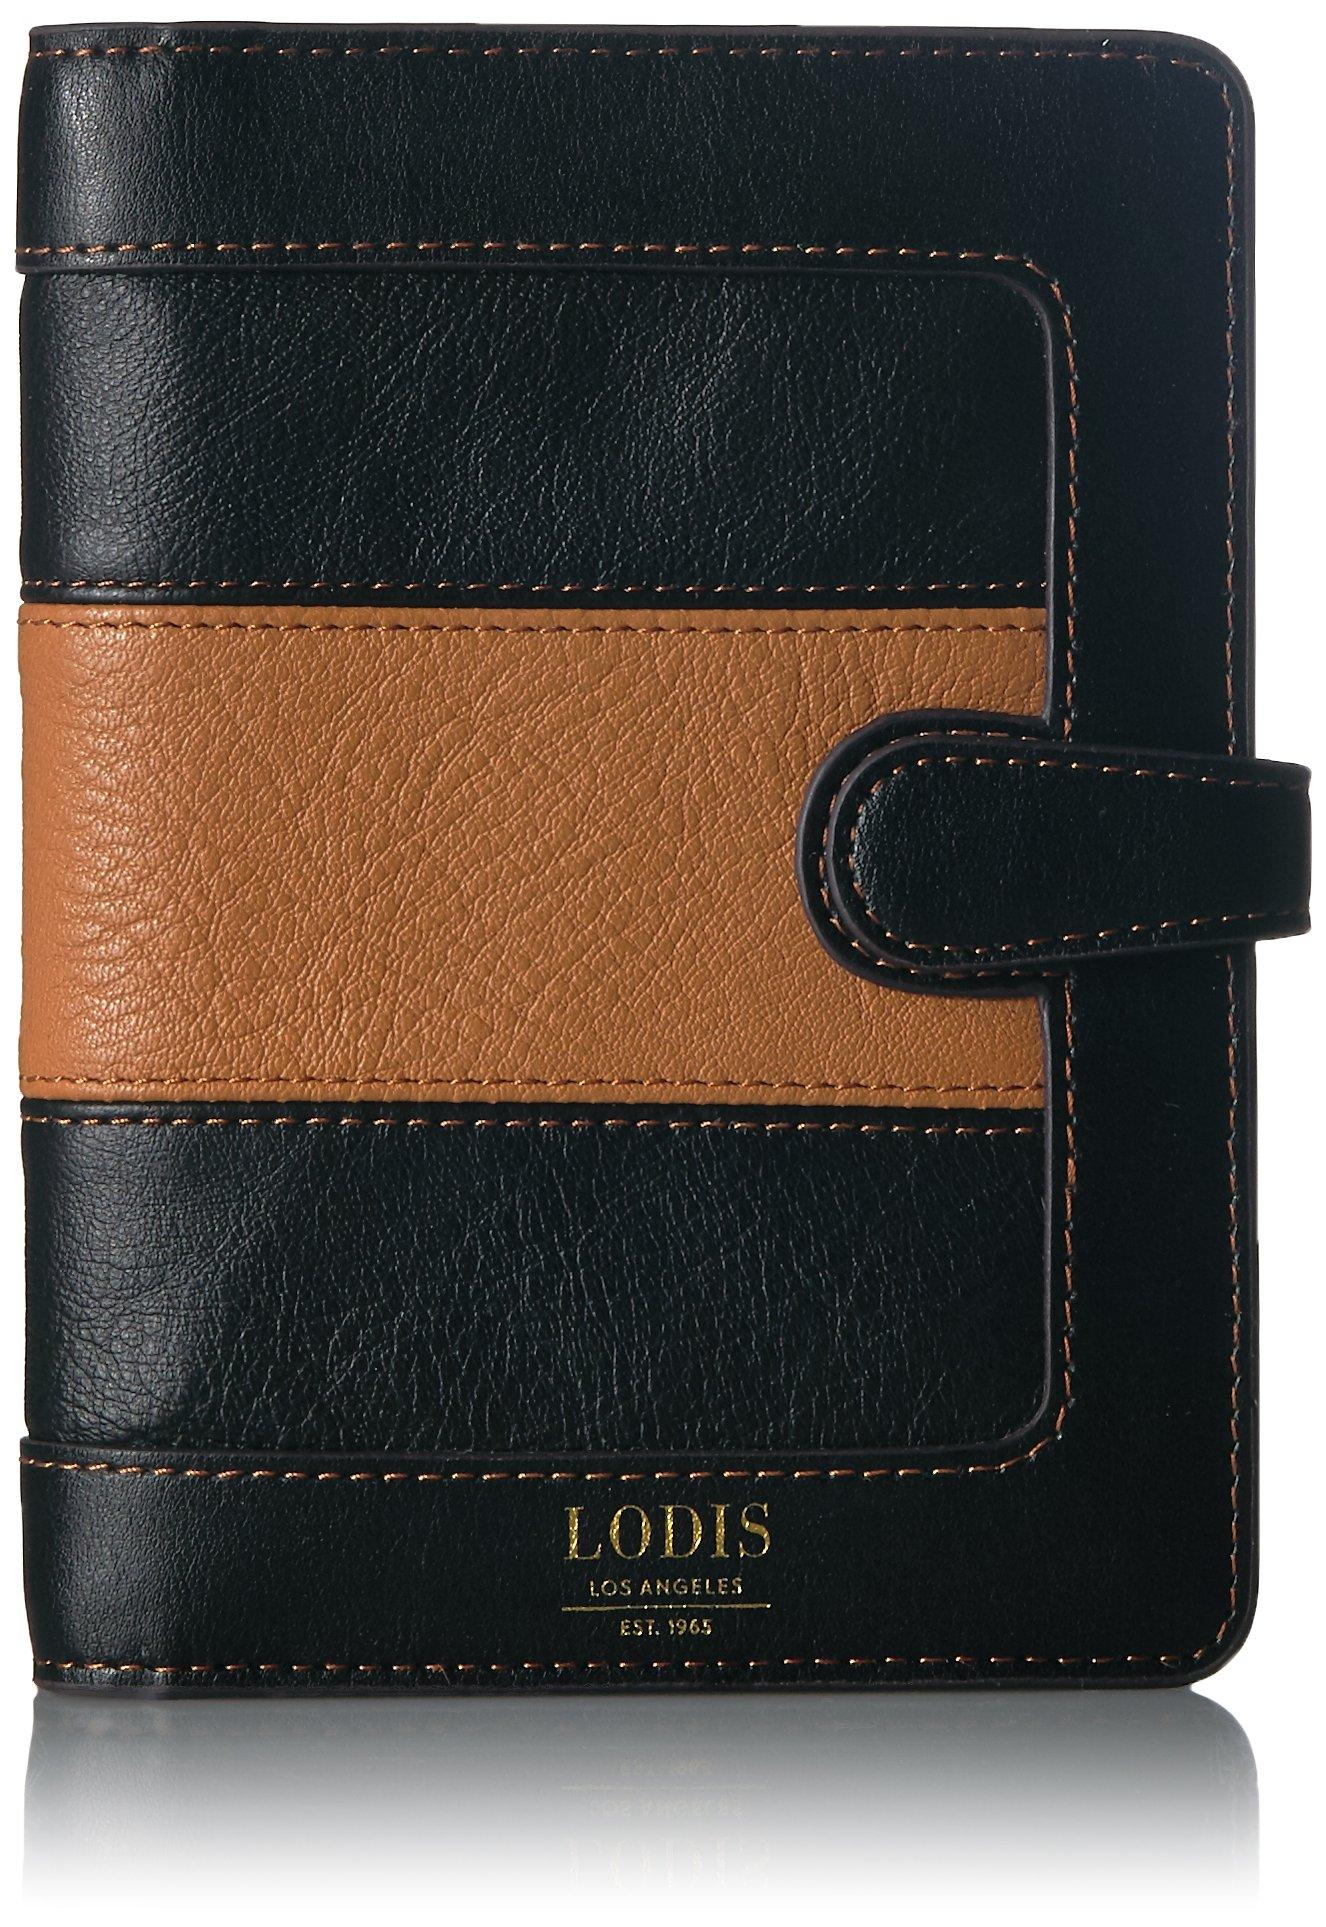 Lodis Laguna Rugby Kimmy Passport Notebook Case, Black